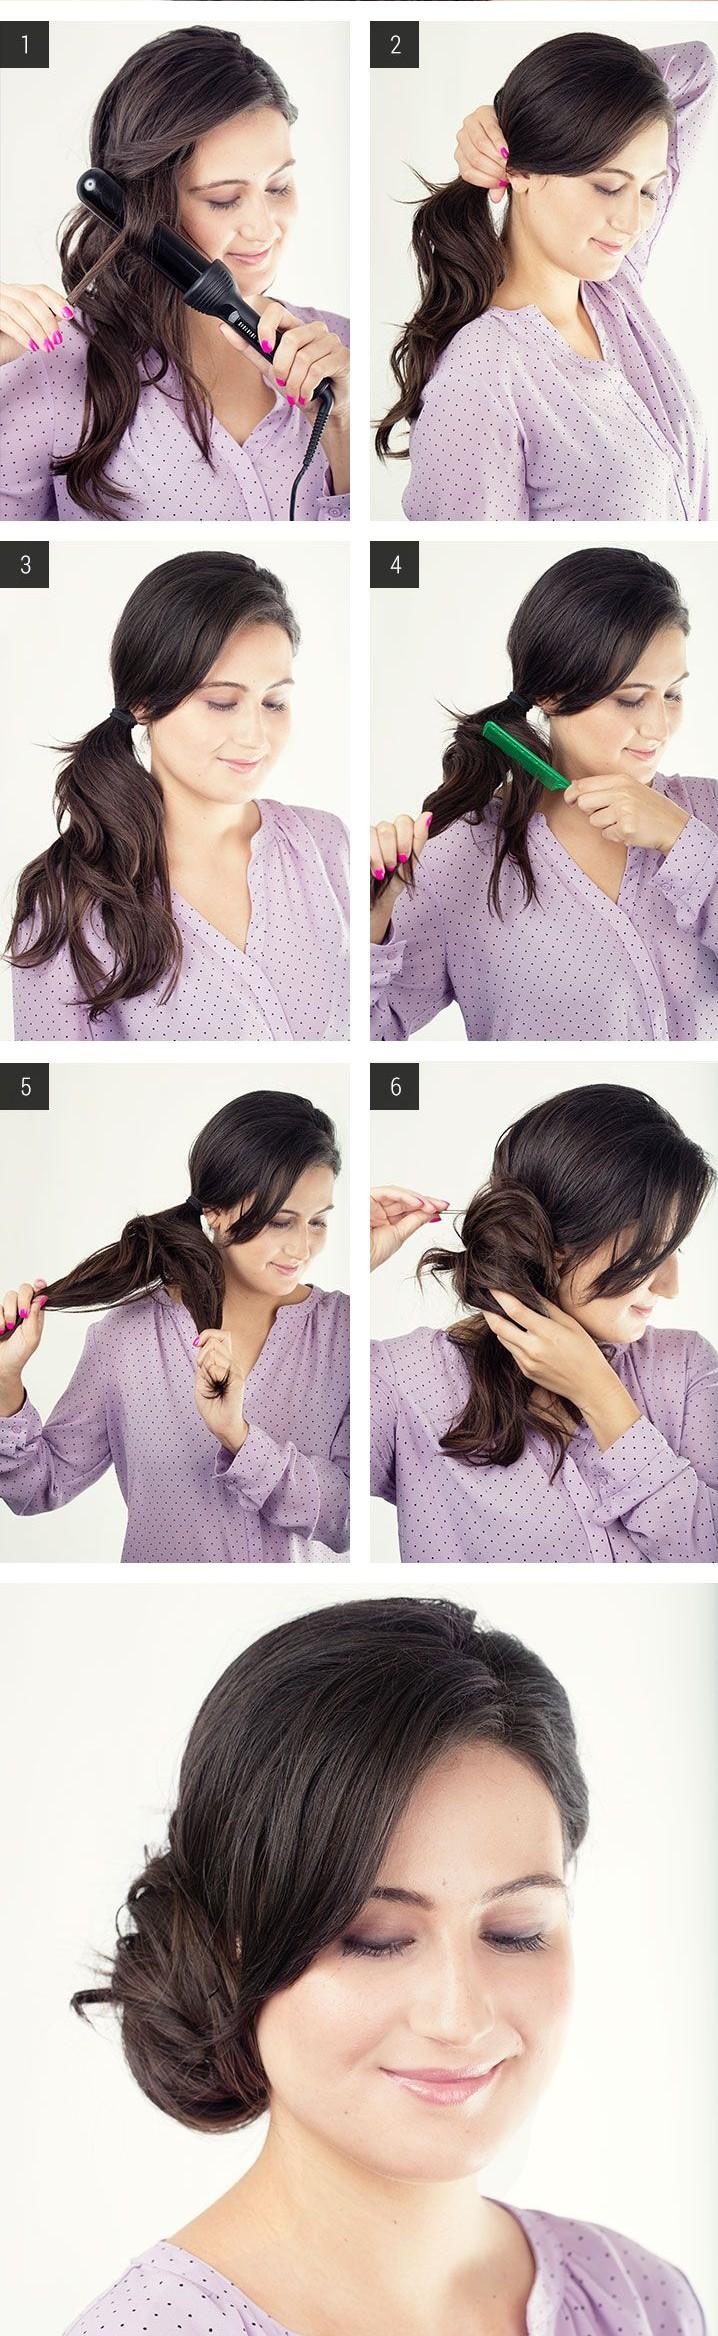 peinados fáciles en 5 minutos (13)